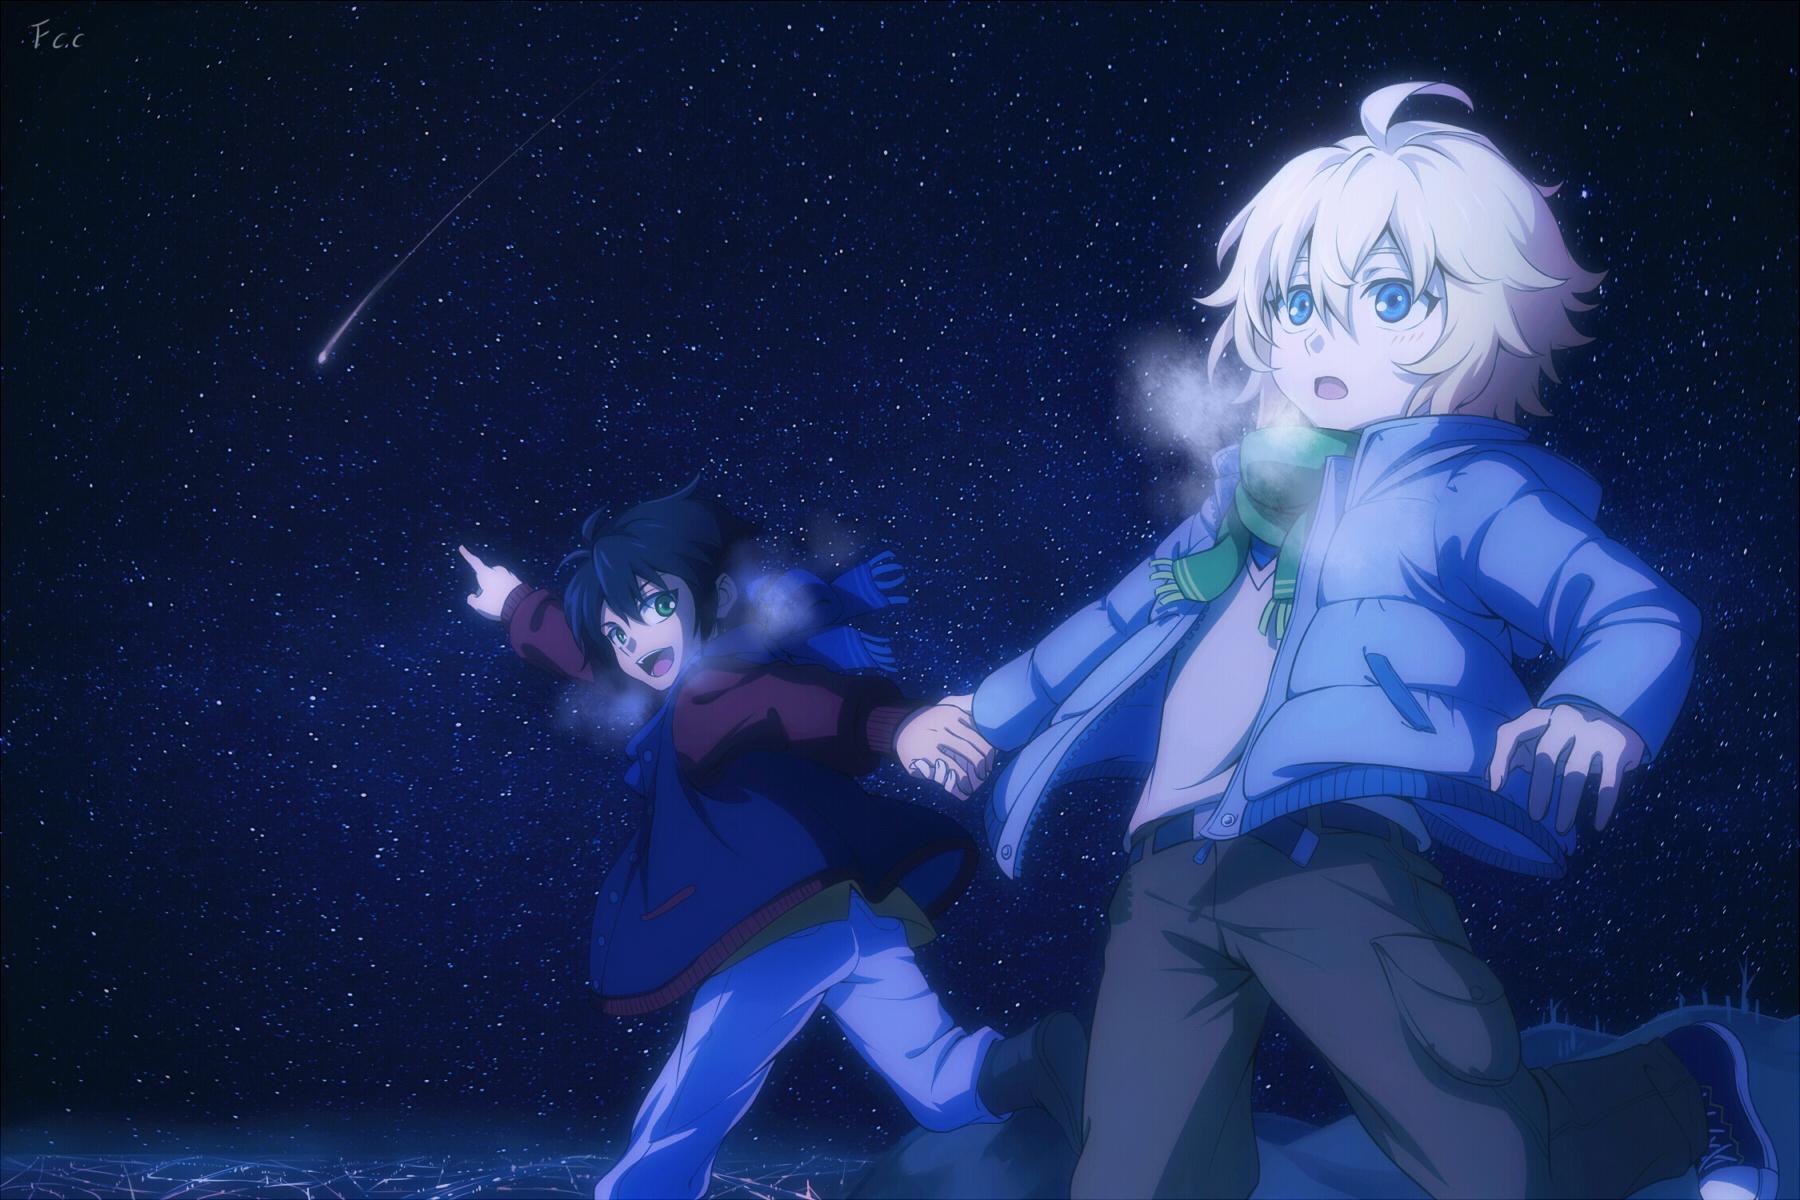 Image Result For Download Wallpaper Anime Owari No Seraph